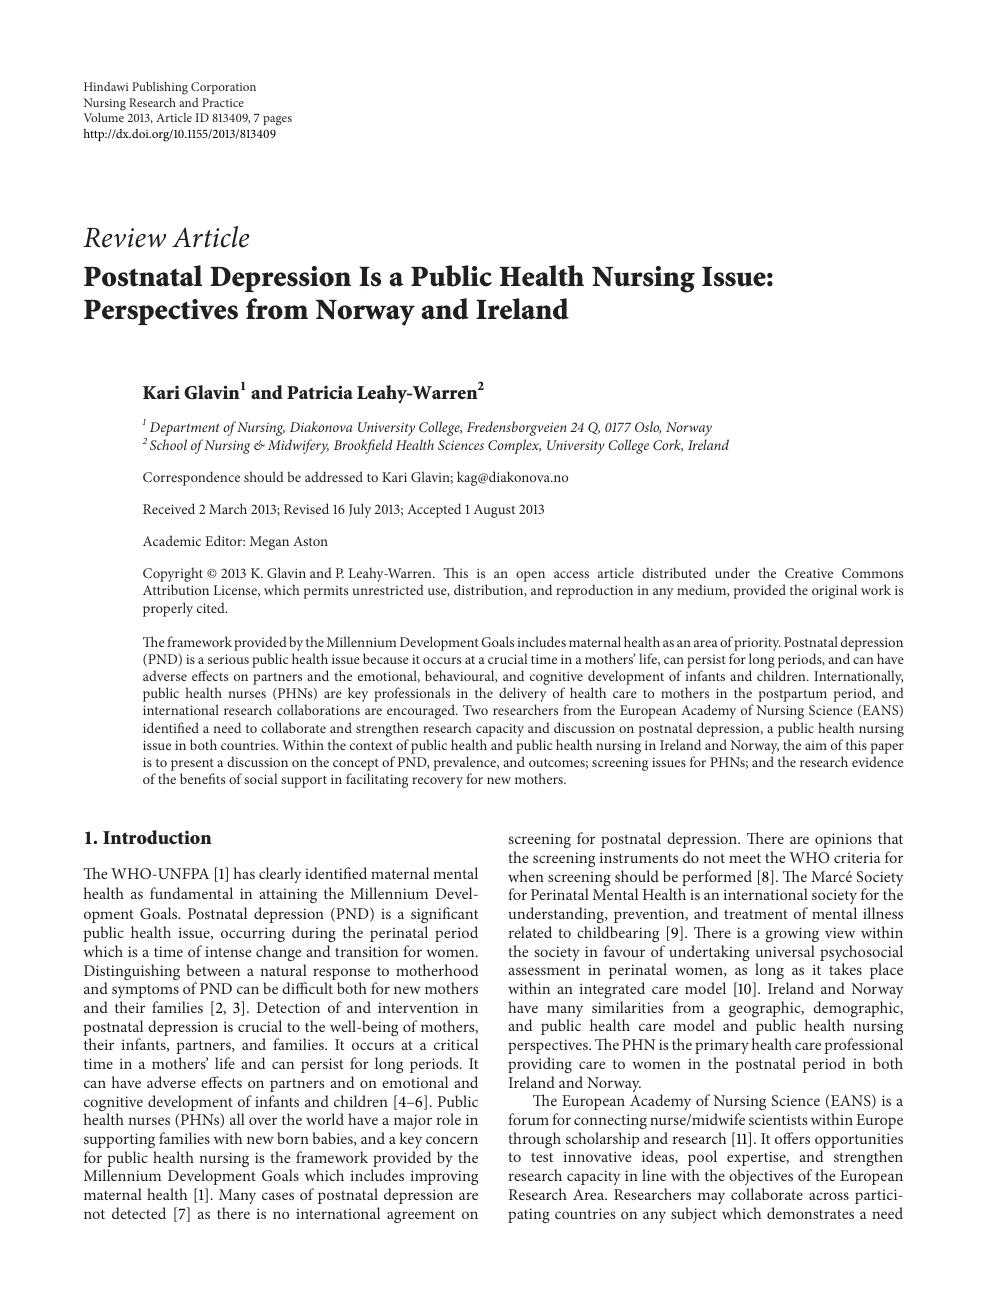 Postnatal Depression Is a Public Health Nursing Issue